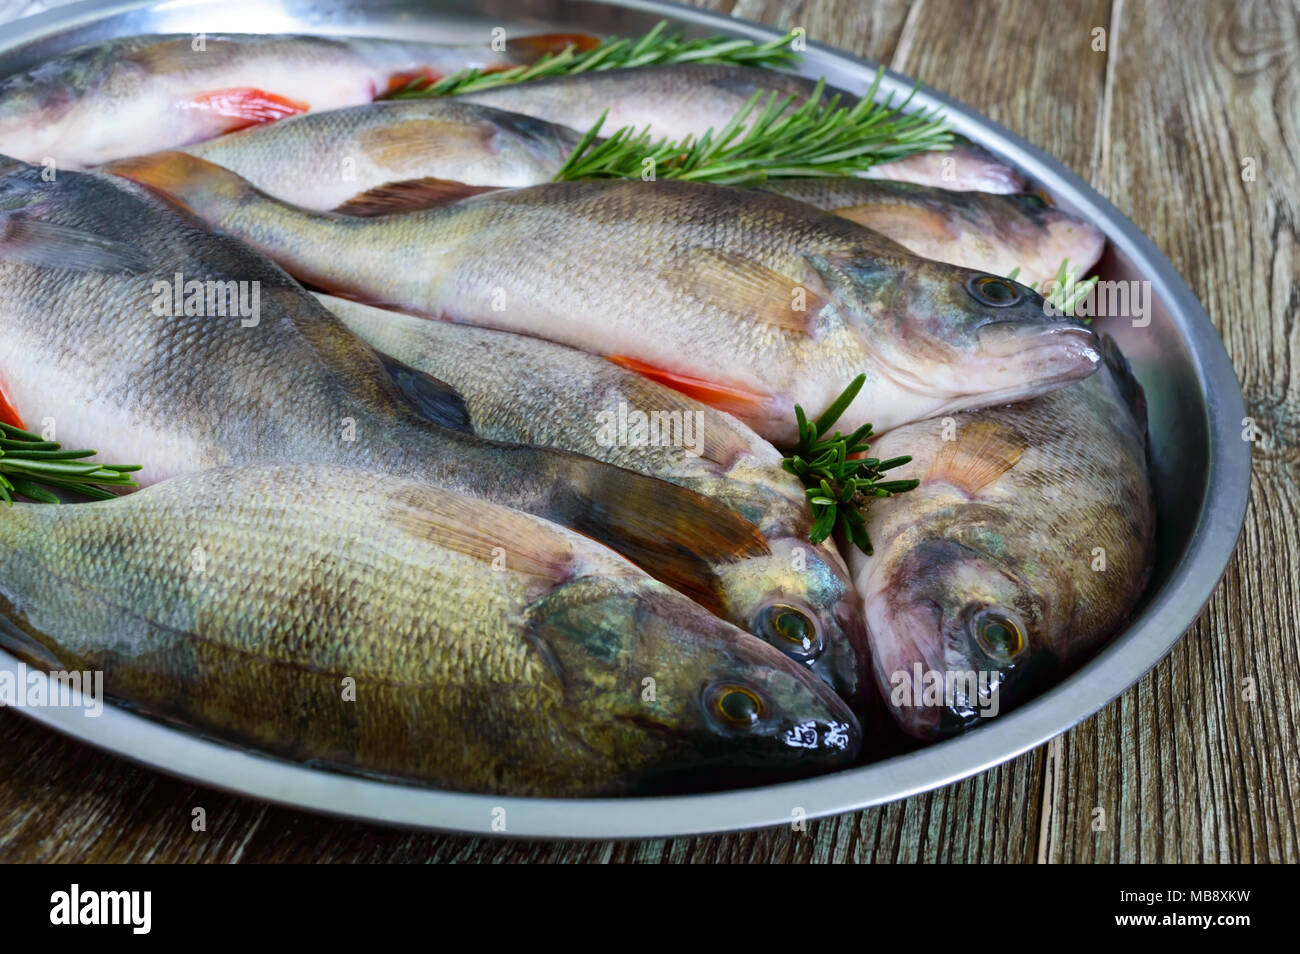 how to catch carp fish